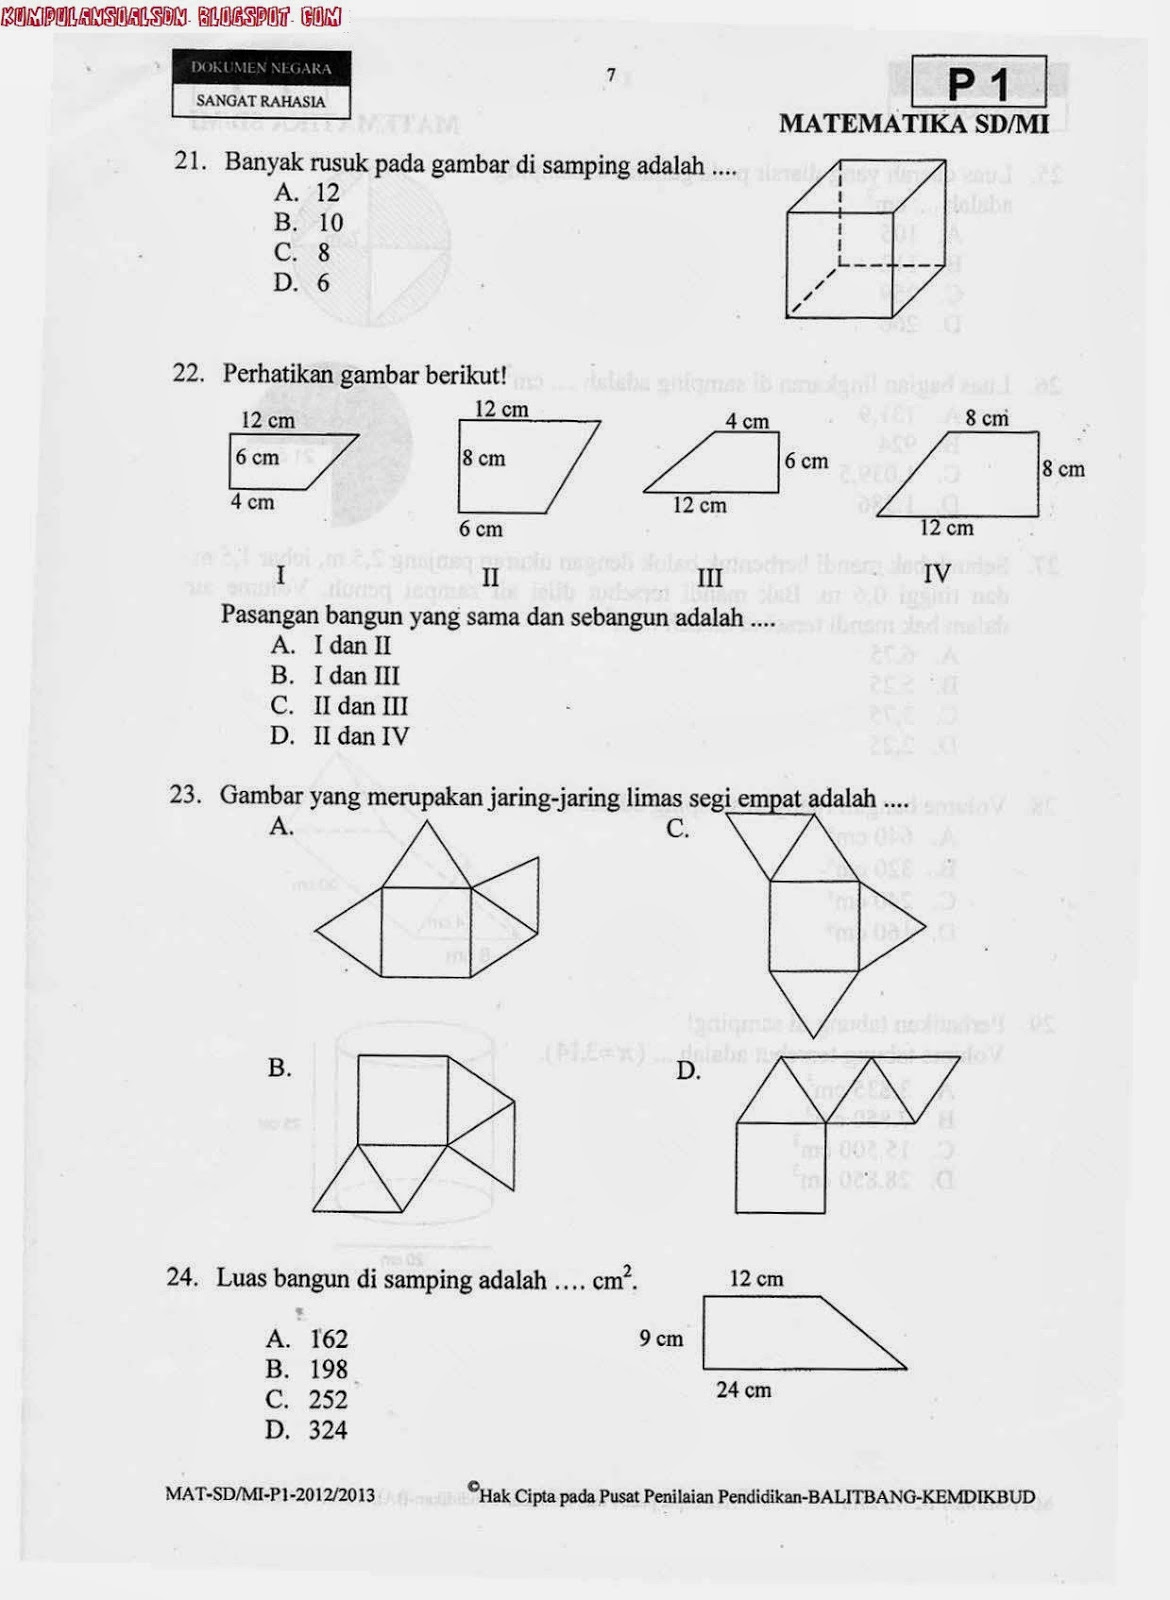 Soal Un Utama Matematika Kelas 6 Sd Ta 2012 2013 Portal Download